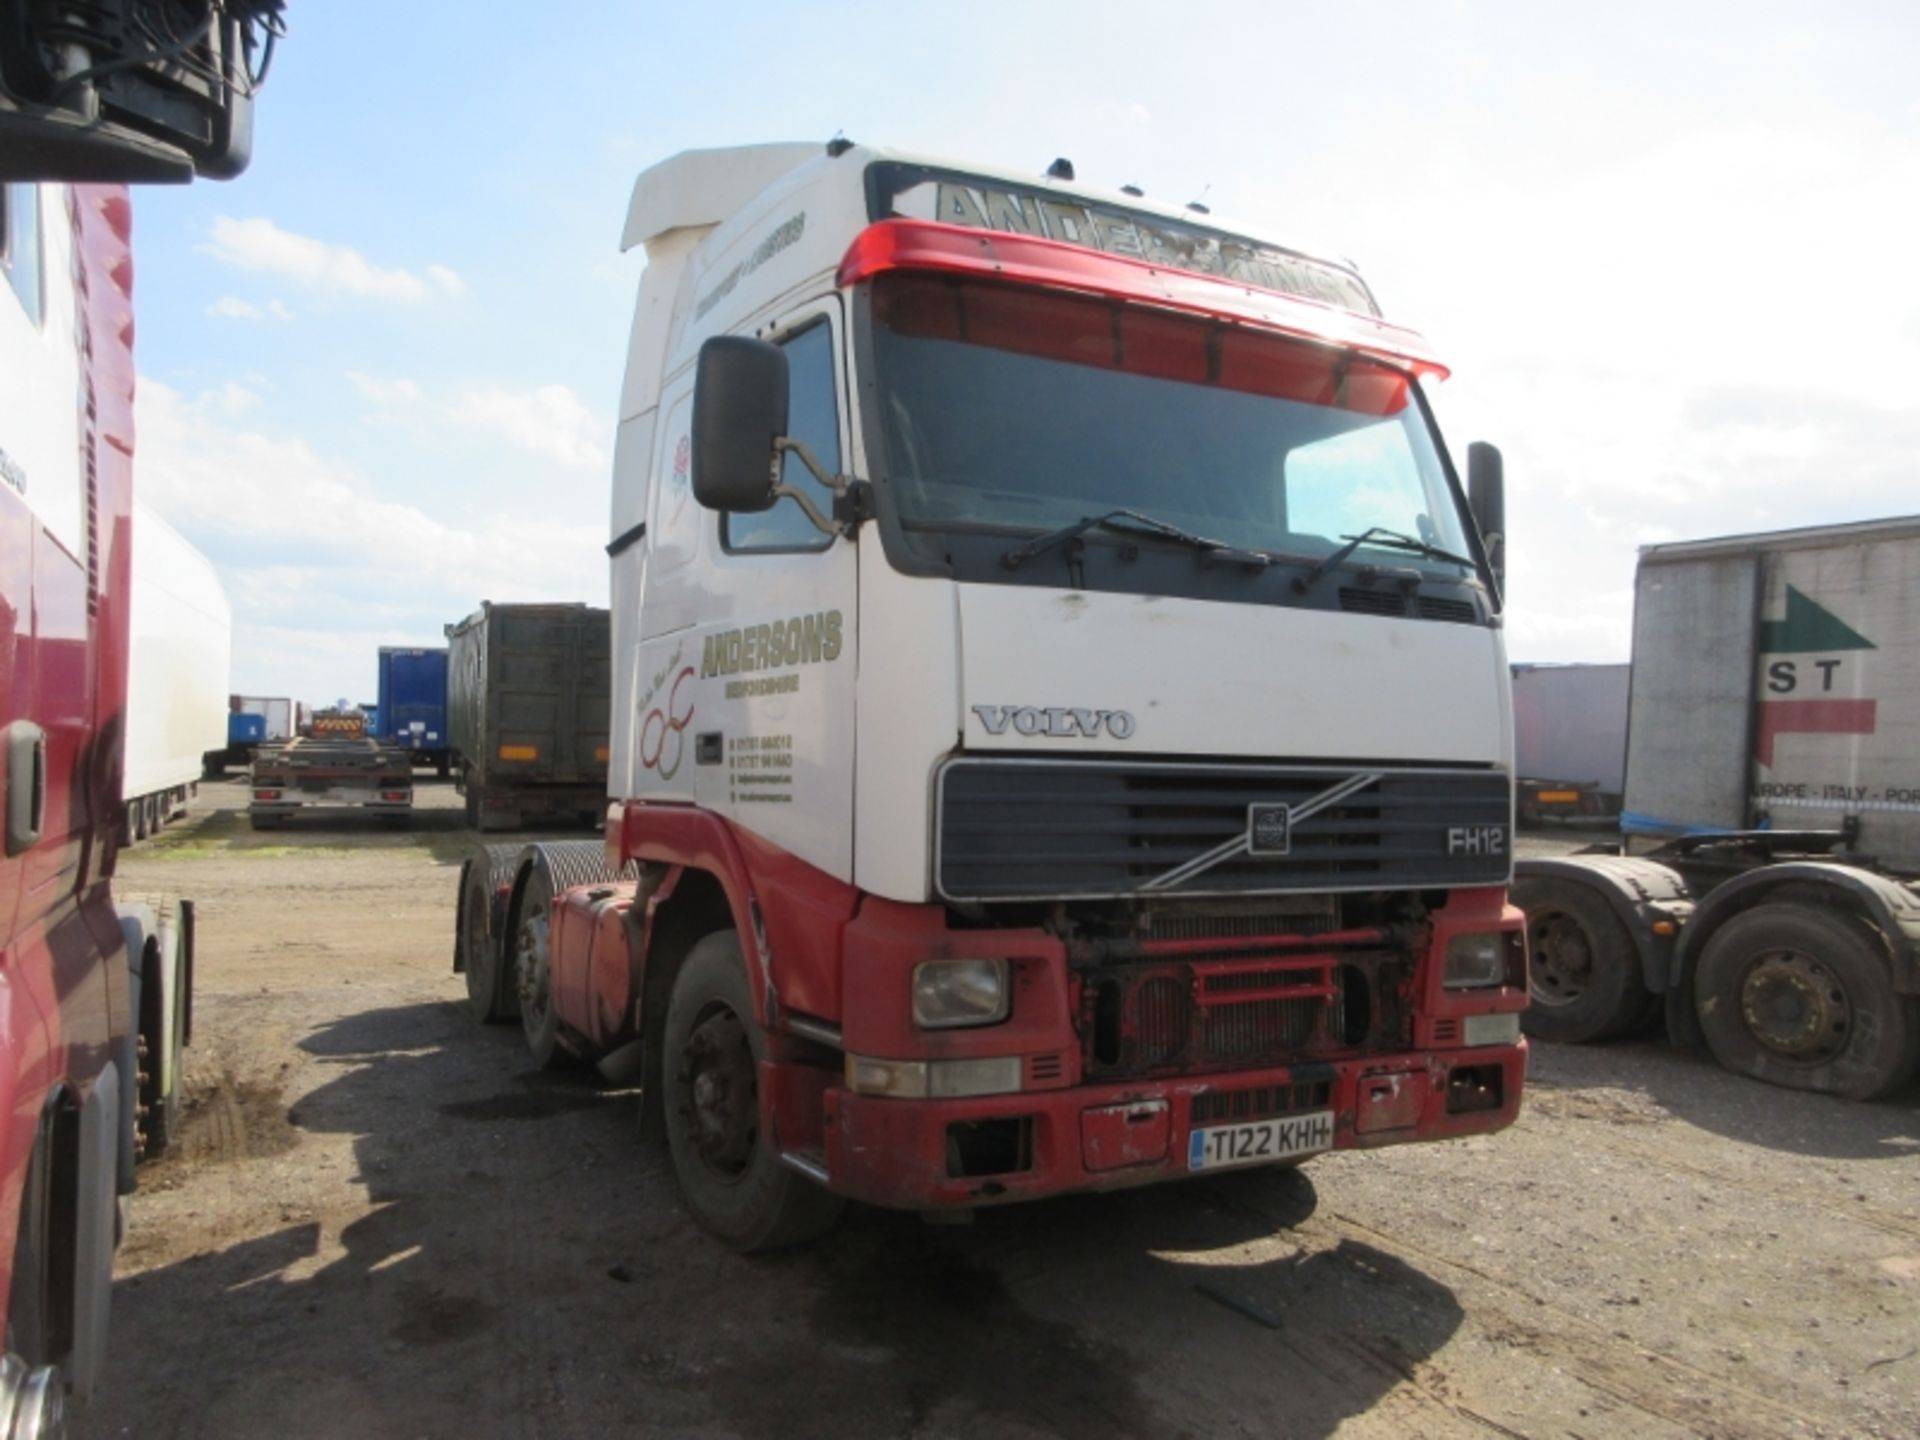 Lot 19 - VOLVO FH12 380 - 12130cc Globetrotter Diesel - VIN: YV2A4DMC3XA297148 - Year: 1999 - no display km -